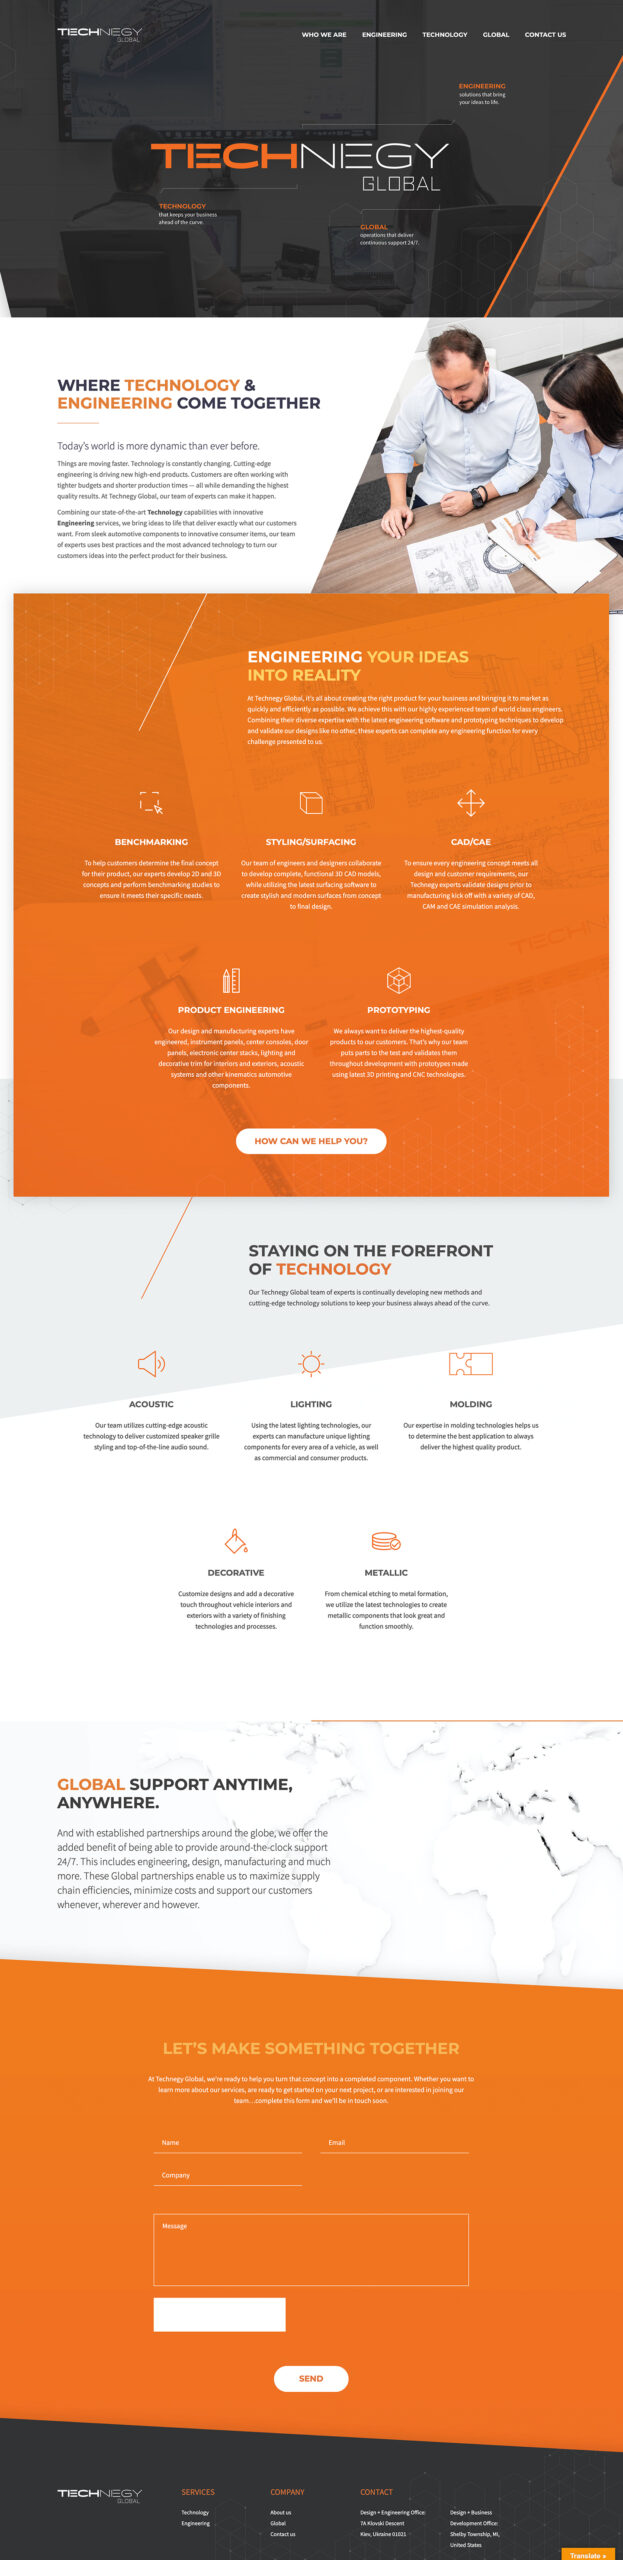 Single-page Website Design